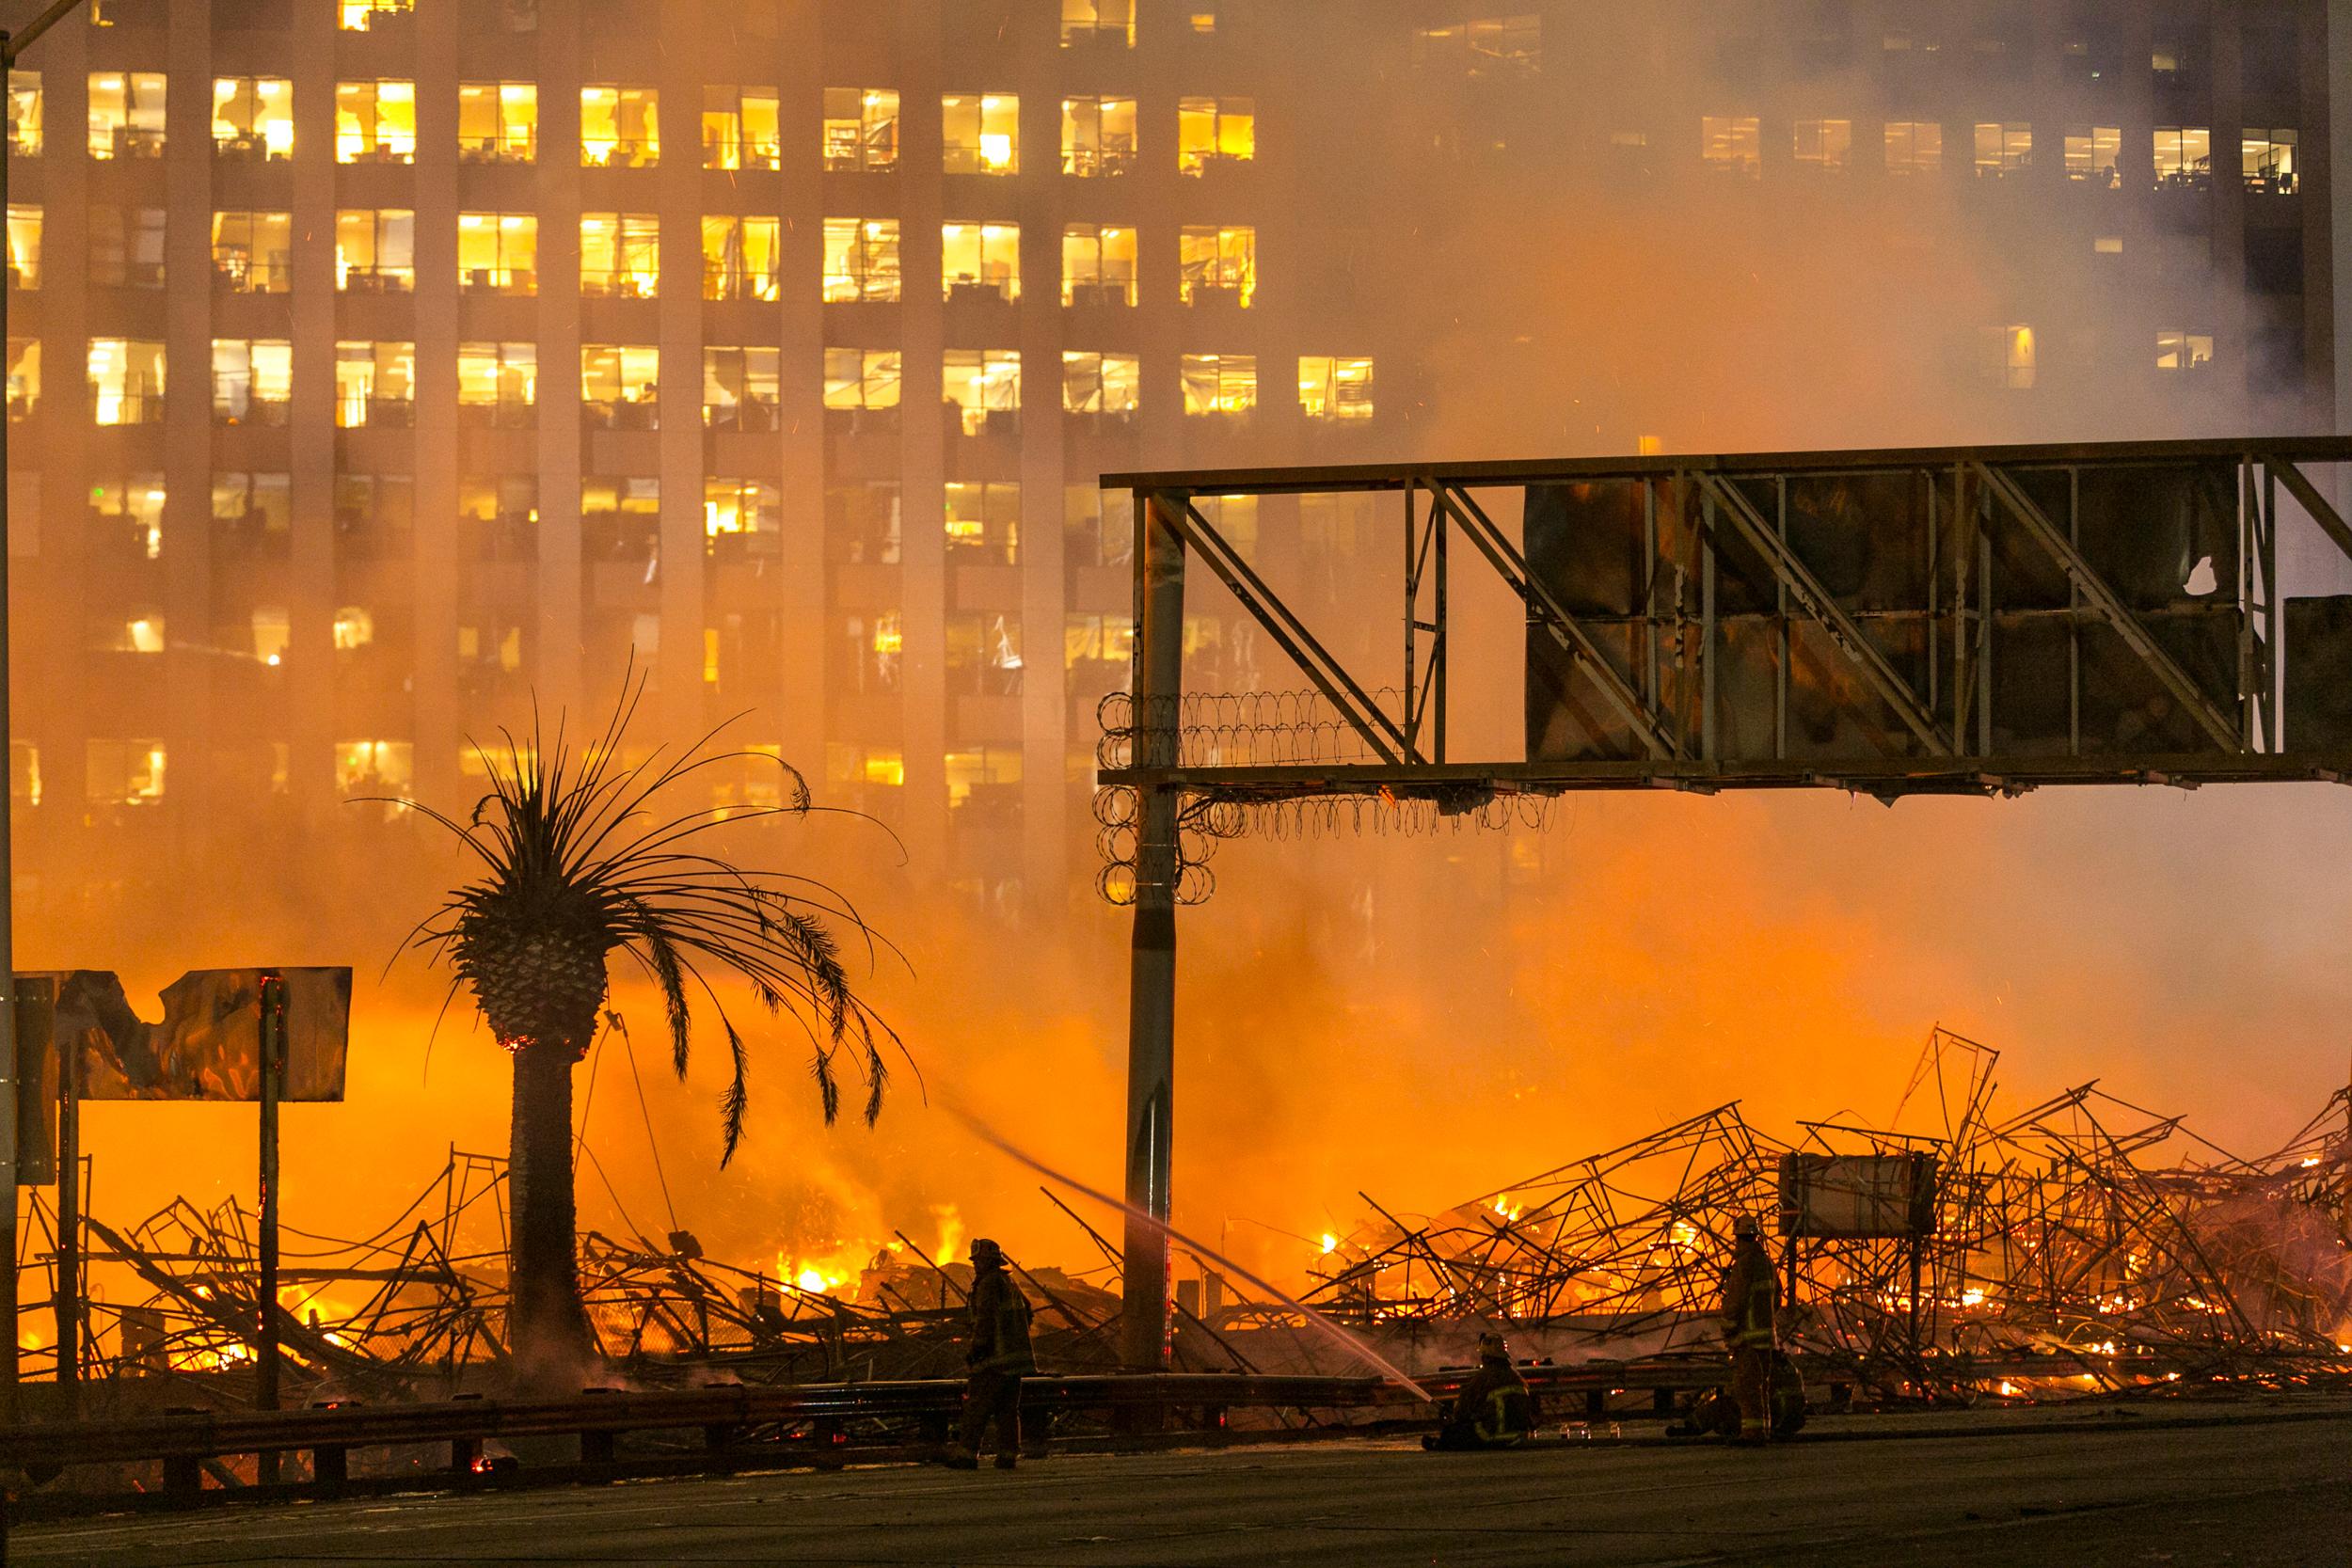 Police Make Arrest in 'Devastating' Da Vinci Fire in Downtown LA